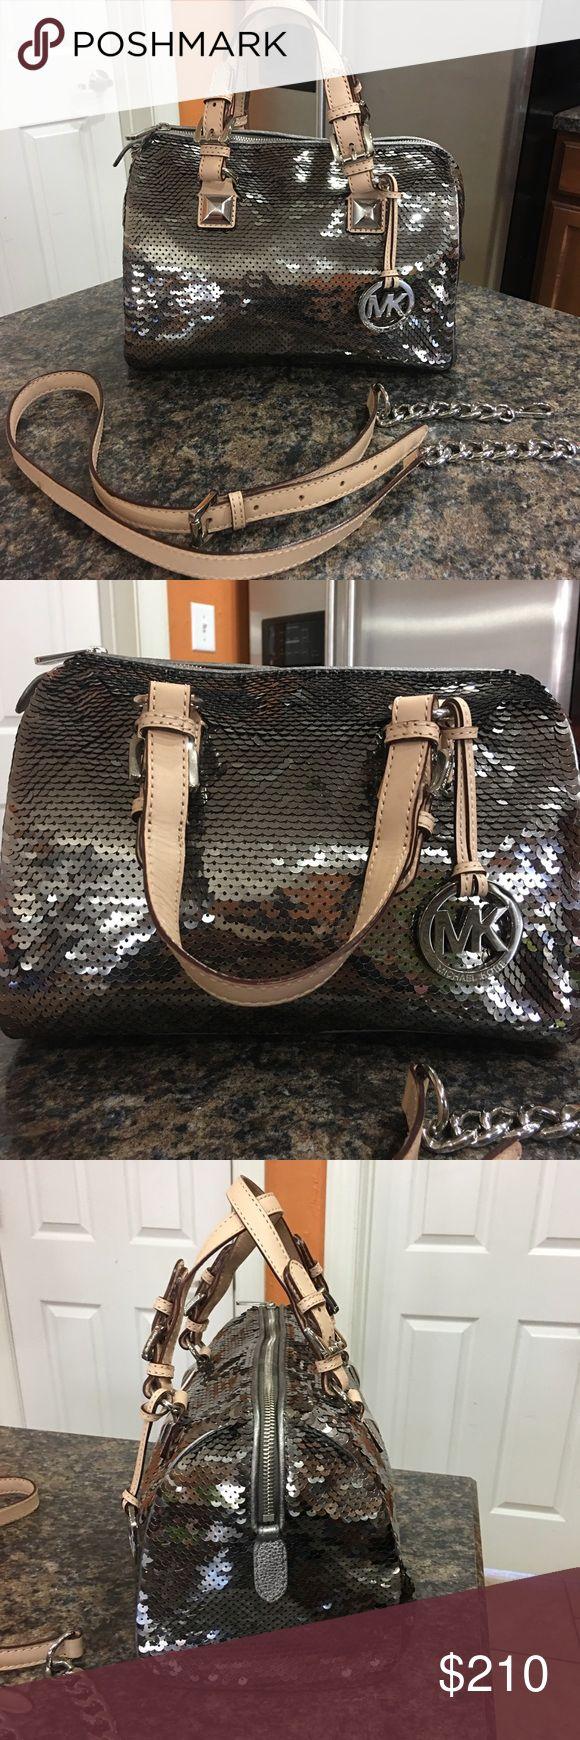 MICHAEL KORS purse NWOT MICHAEL KORS purse never used Great Christmas present! Michael Kors Bags Satchels